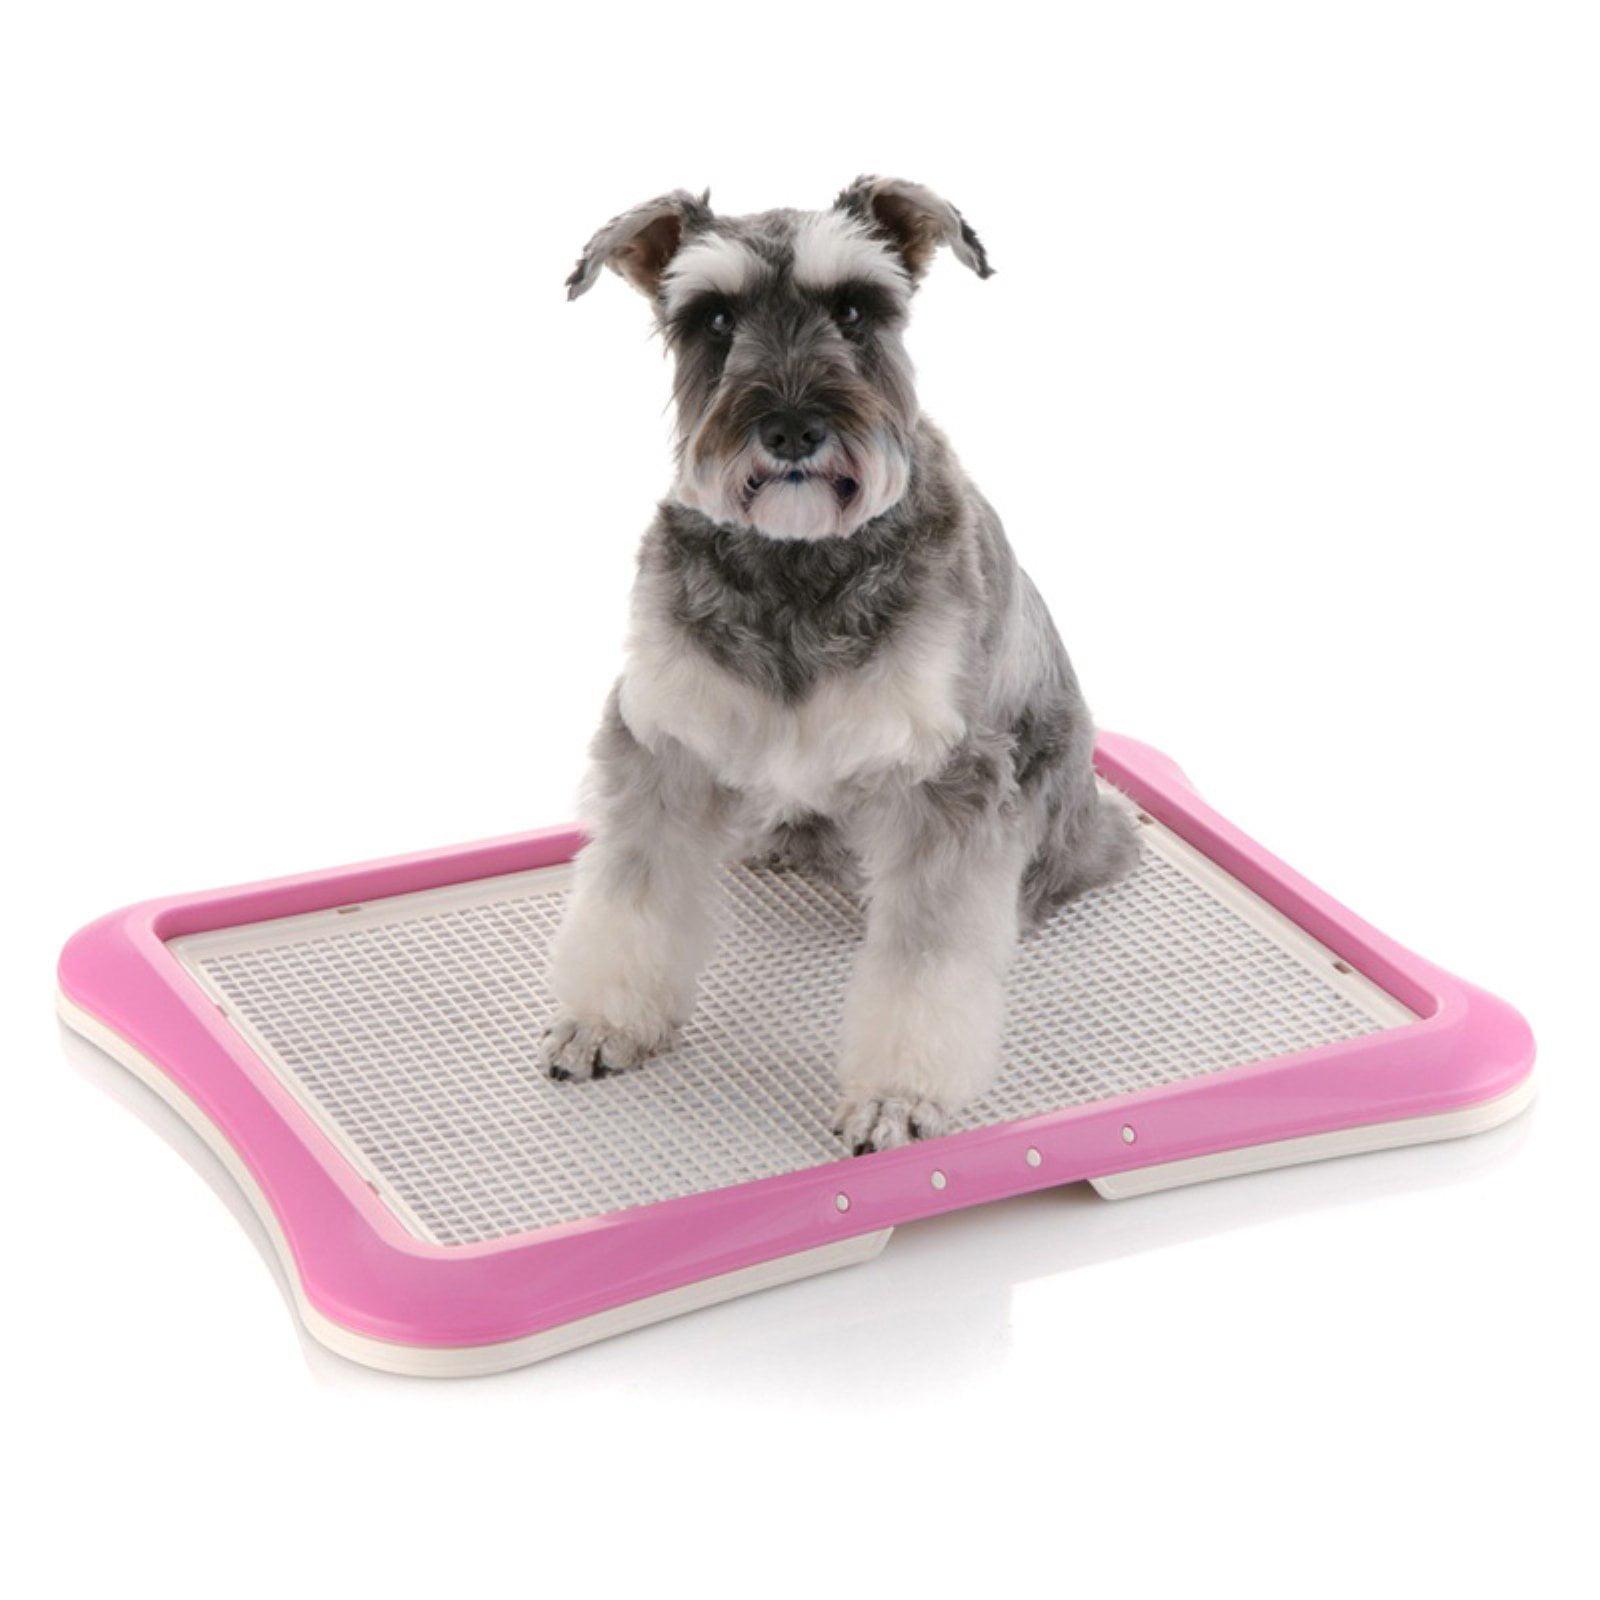 "Richell Paw Trax Mesh Training Tray, Pink, 25.2"" x 18.9"" x 1.6"""